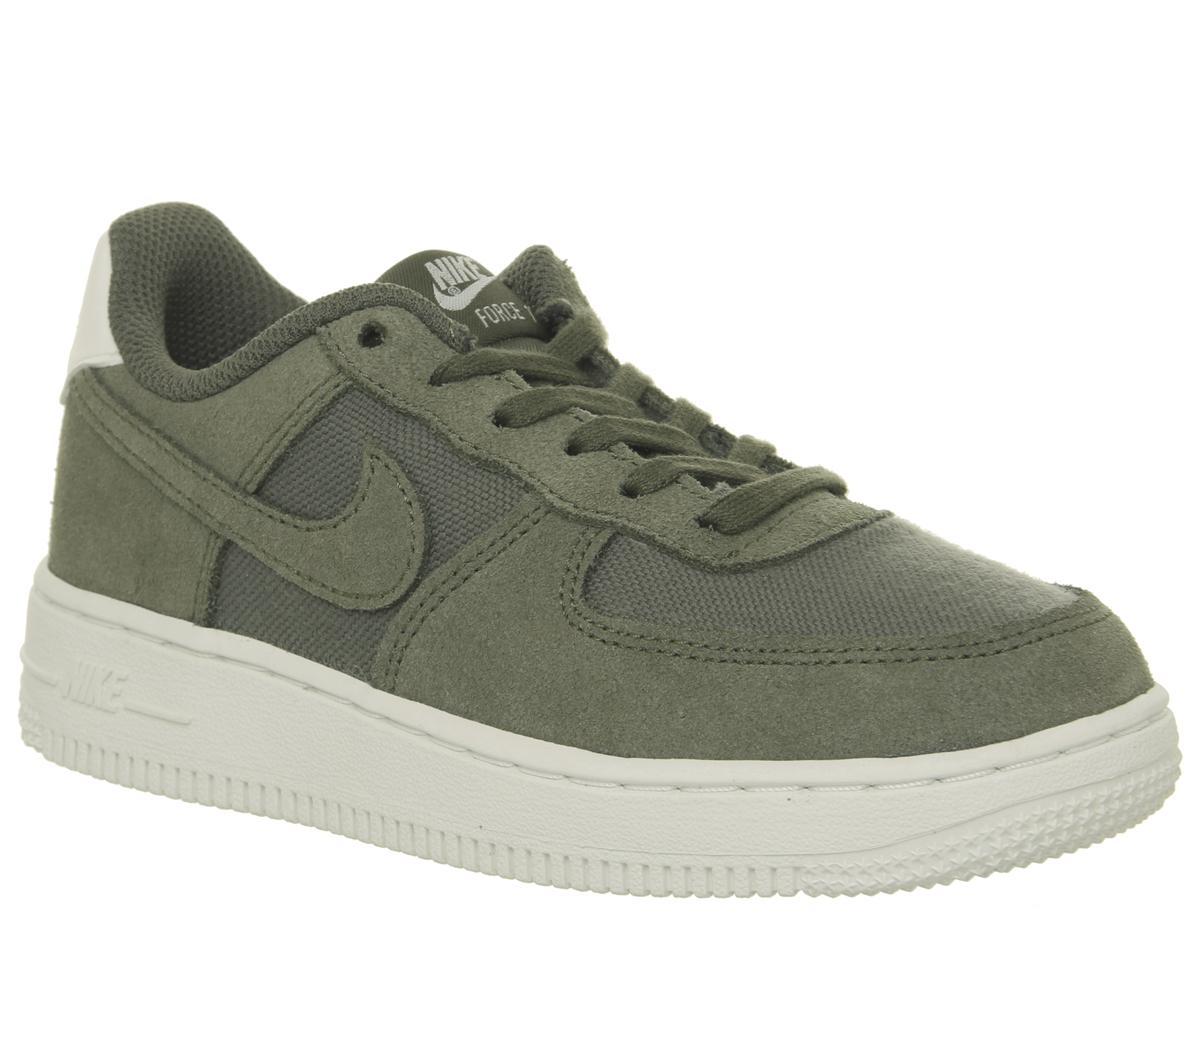 Nike Air Force 1 Ps Trainers Khaki